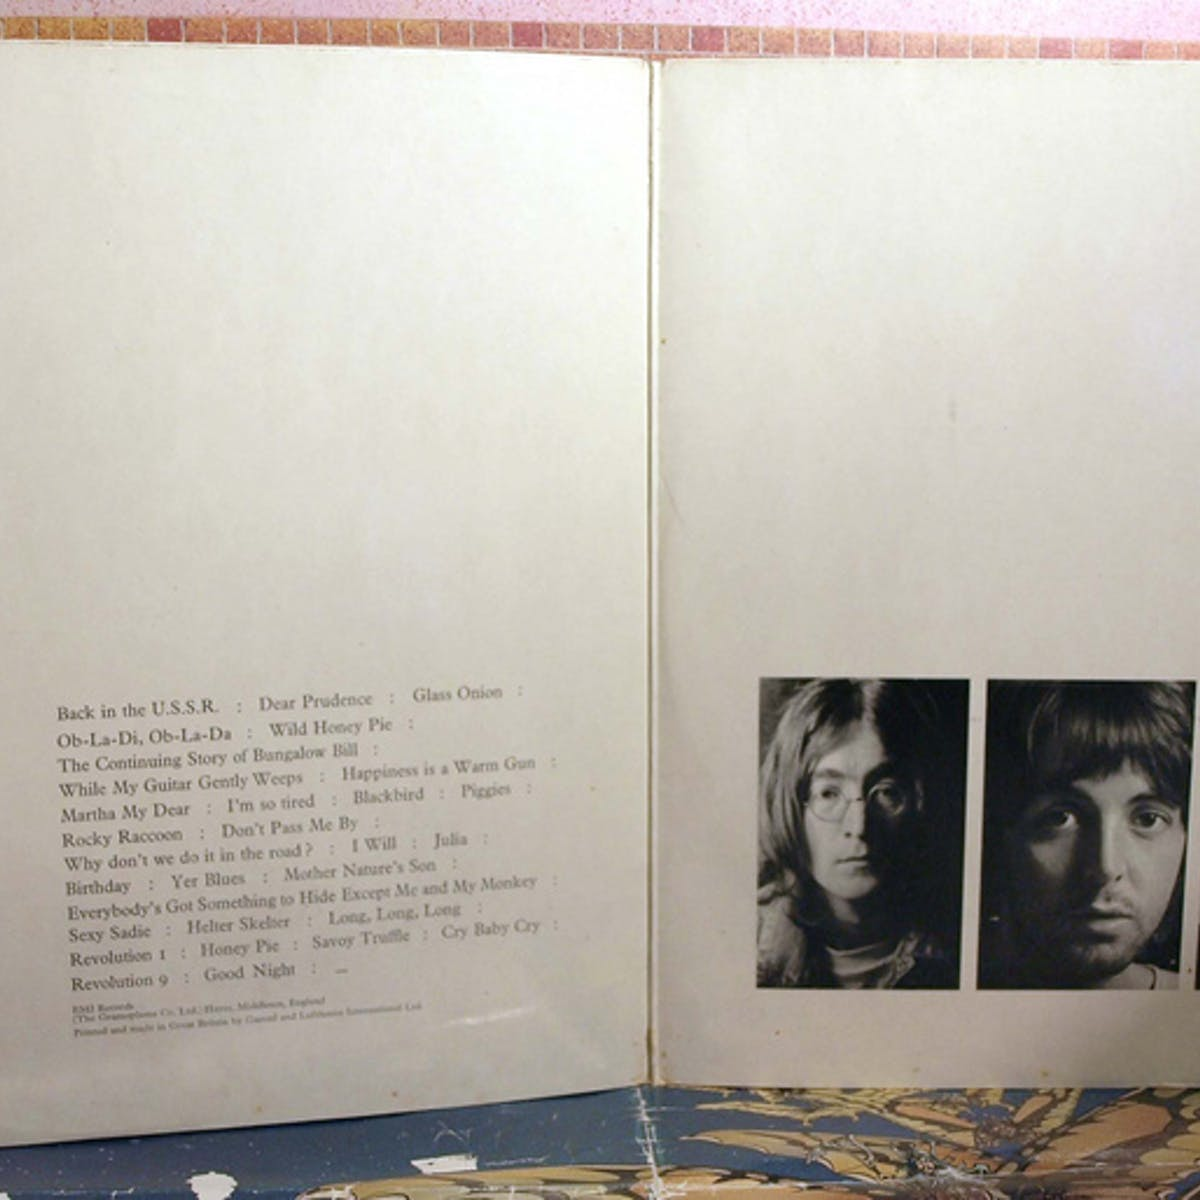 The Beatles White Album at 50: its avant garde eclecticism